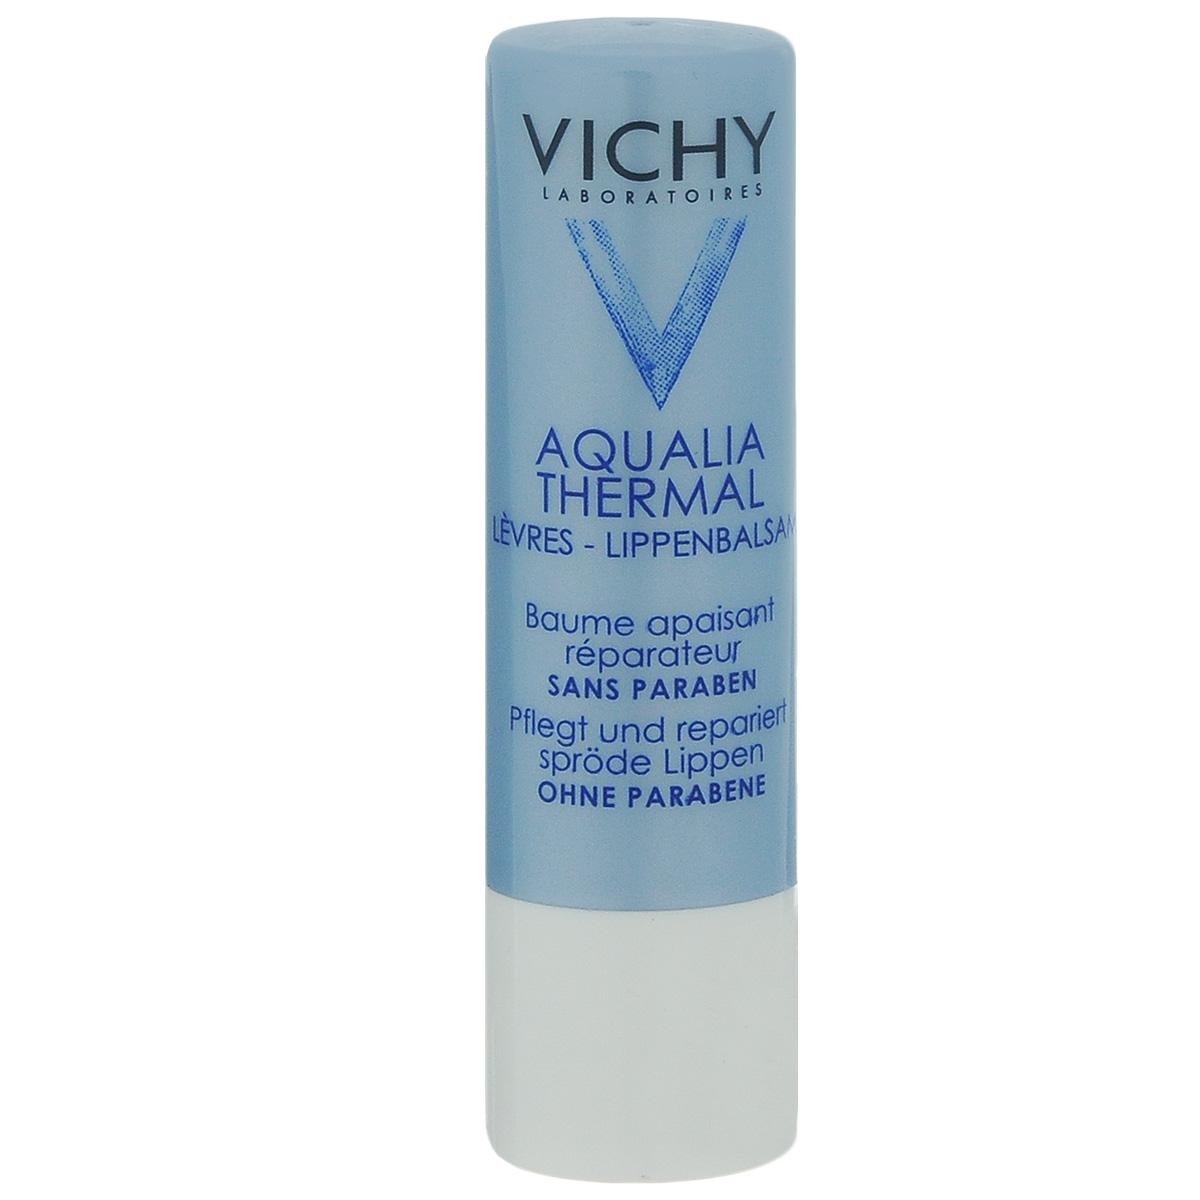 Vichy Aqualia Thermal Увлажняющий и восстанавливающий бальзам для губ Aqualia Thermal, 5 мл (VICHY)